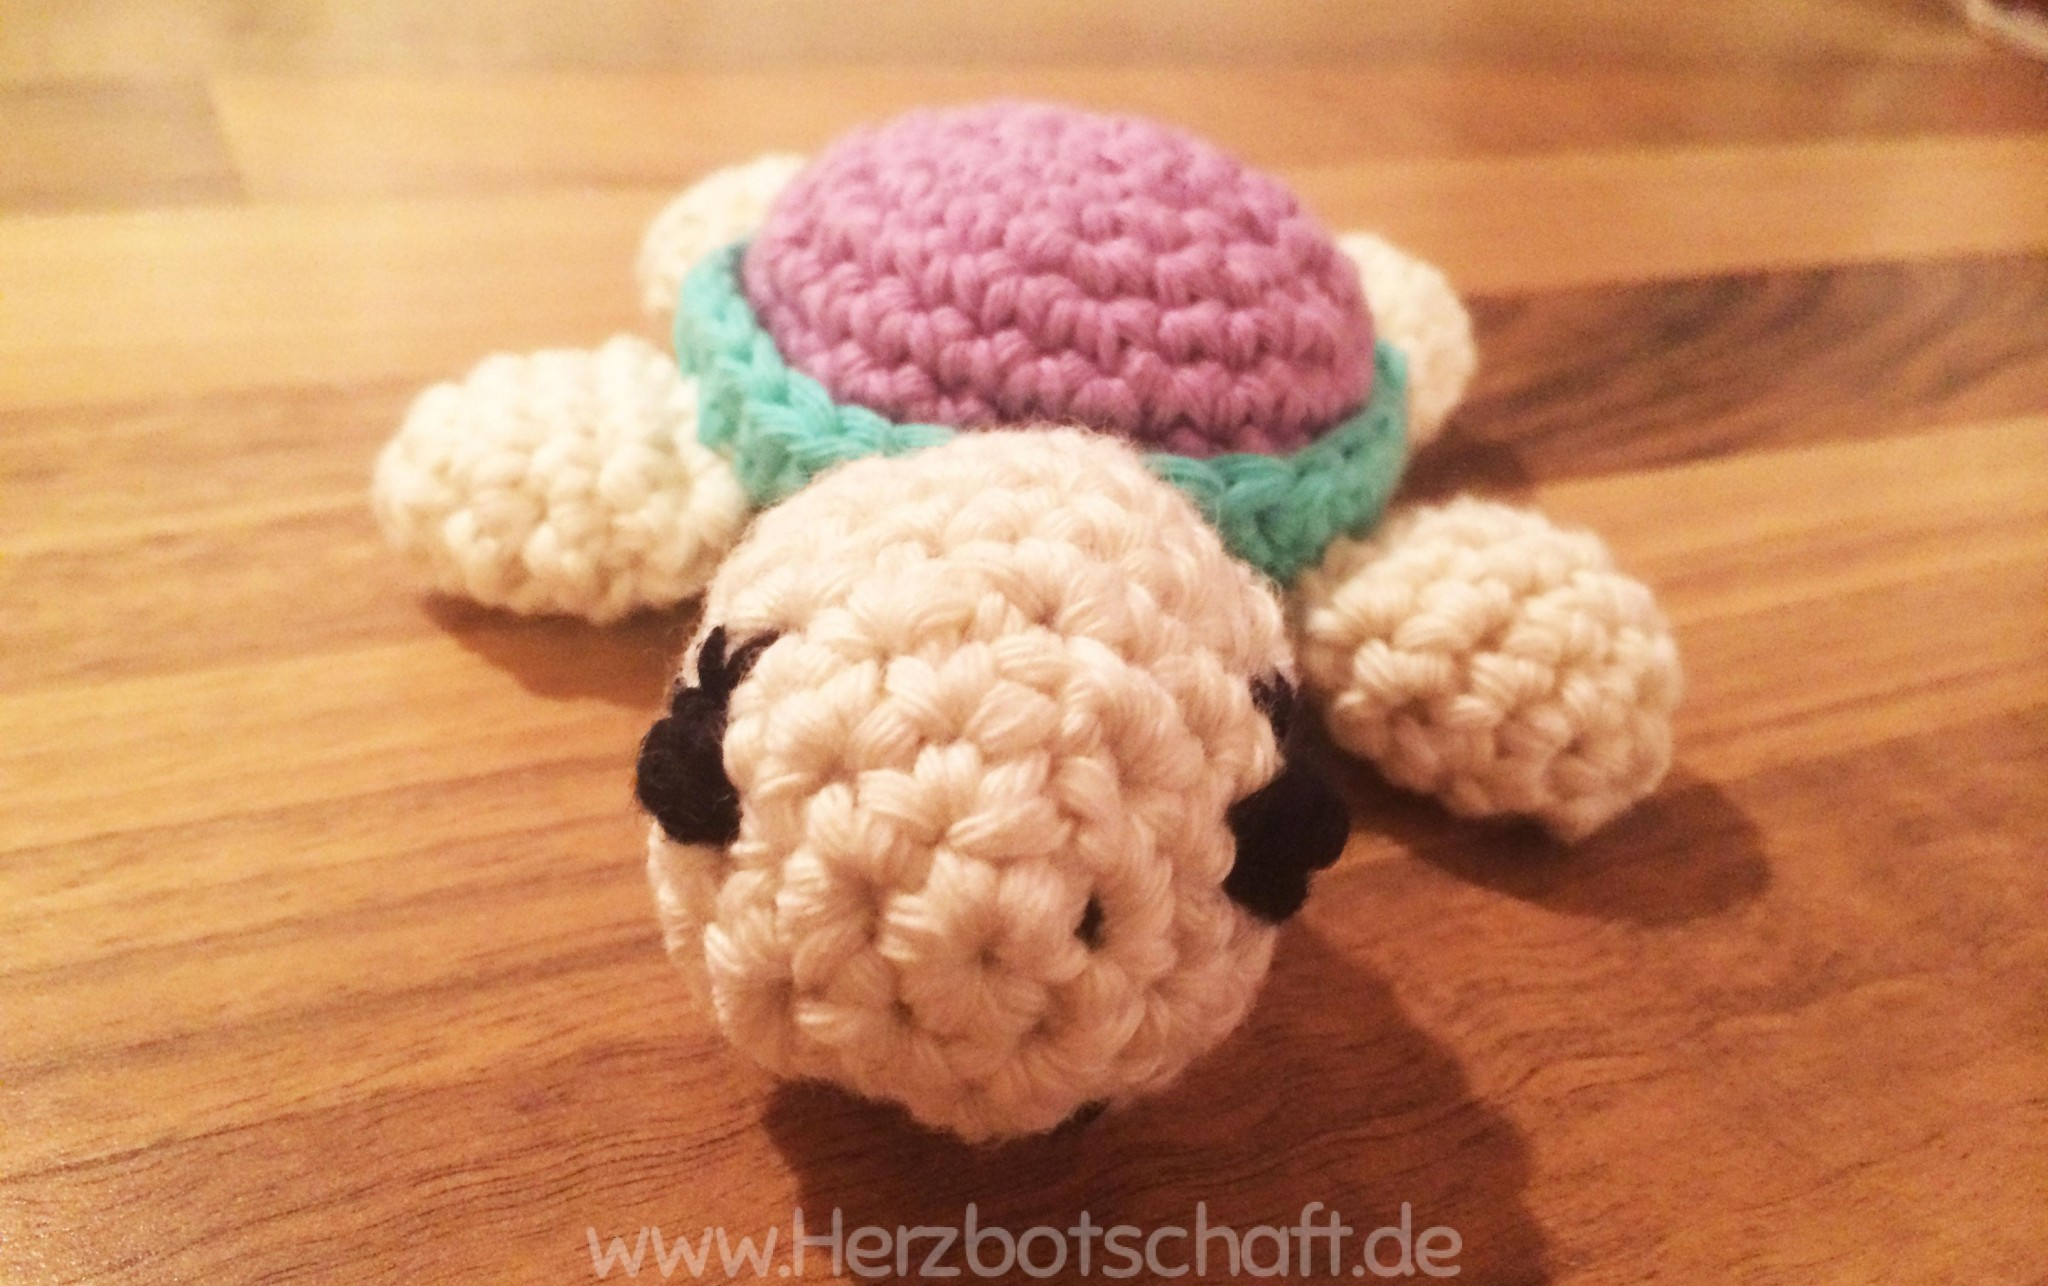 Häkelanleitung Süße Gehäkelte Amigurumi Schildkröte